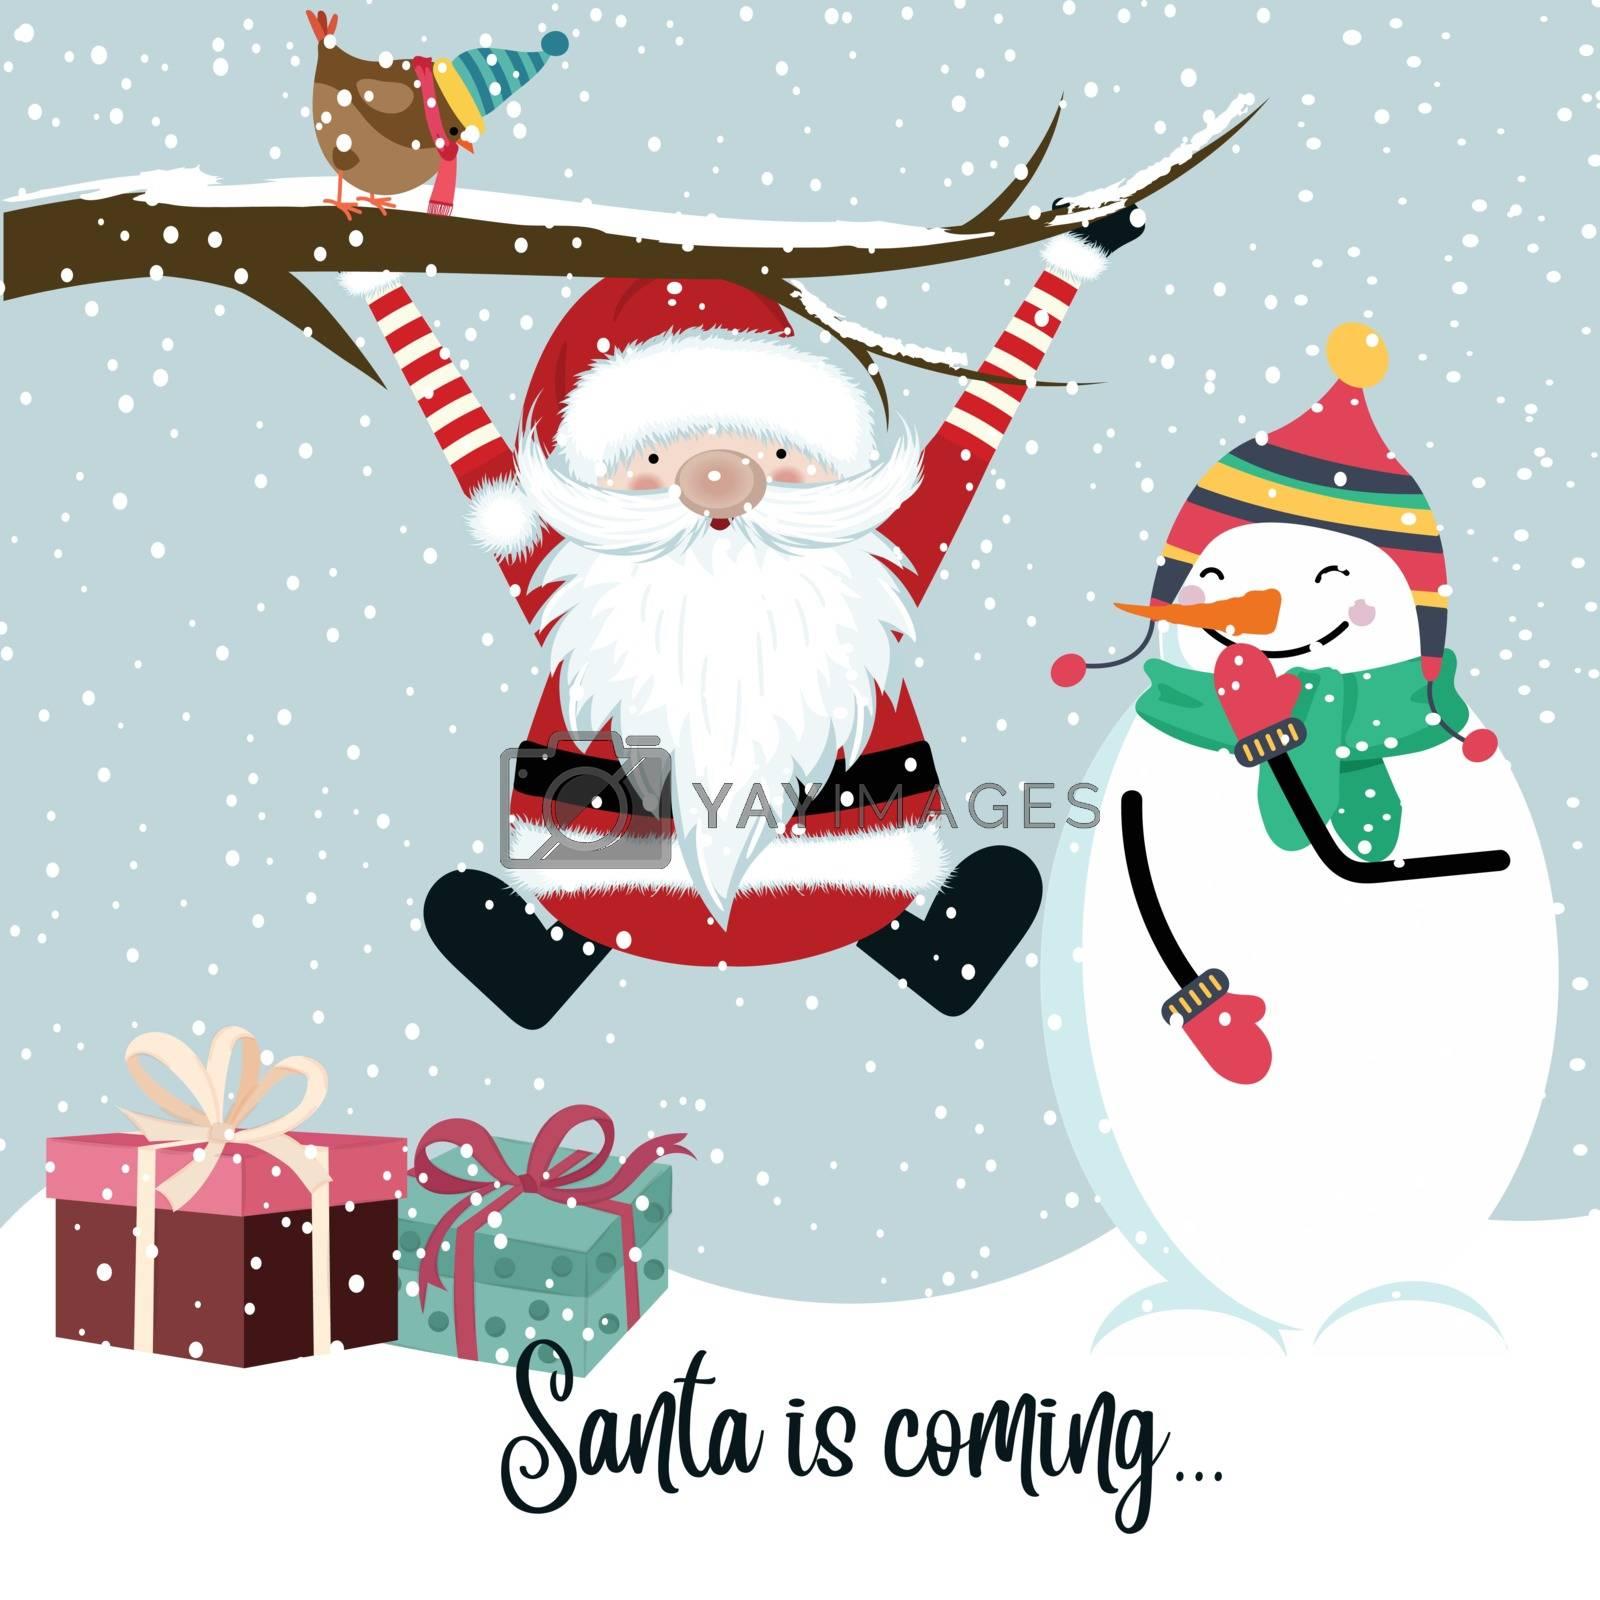 Santa is coming, funny Christmas illustration